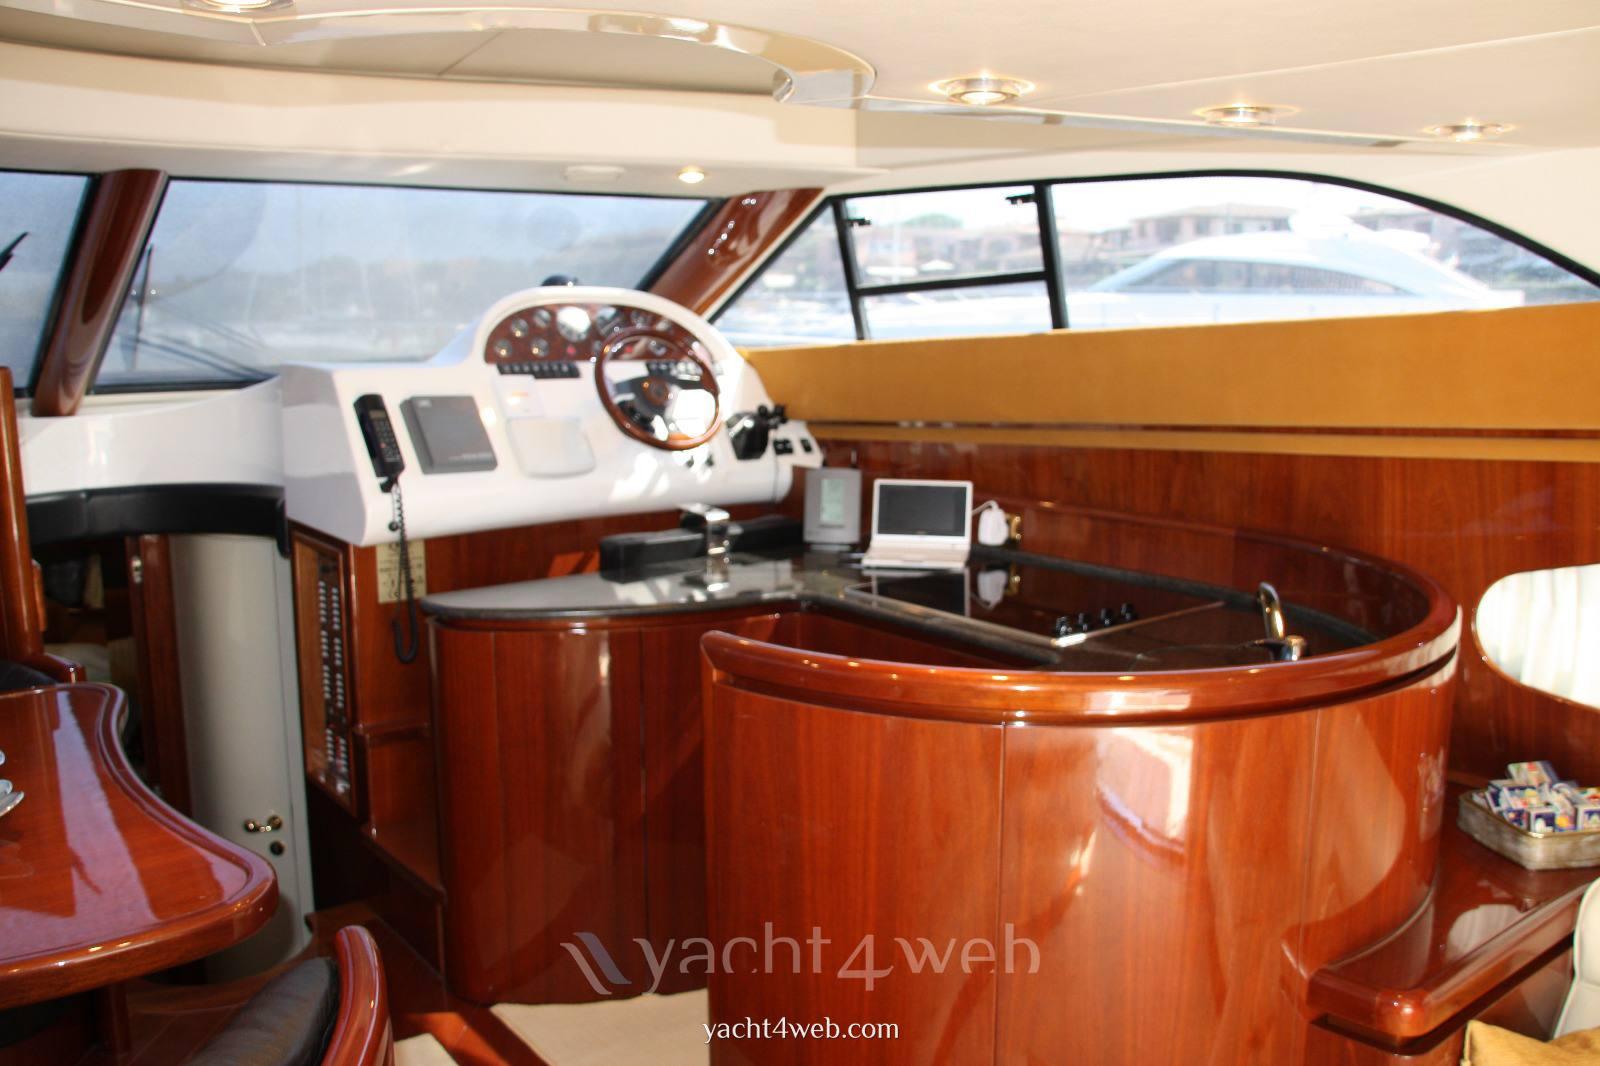 Admiral 153 rdesign used